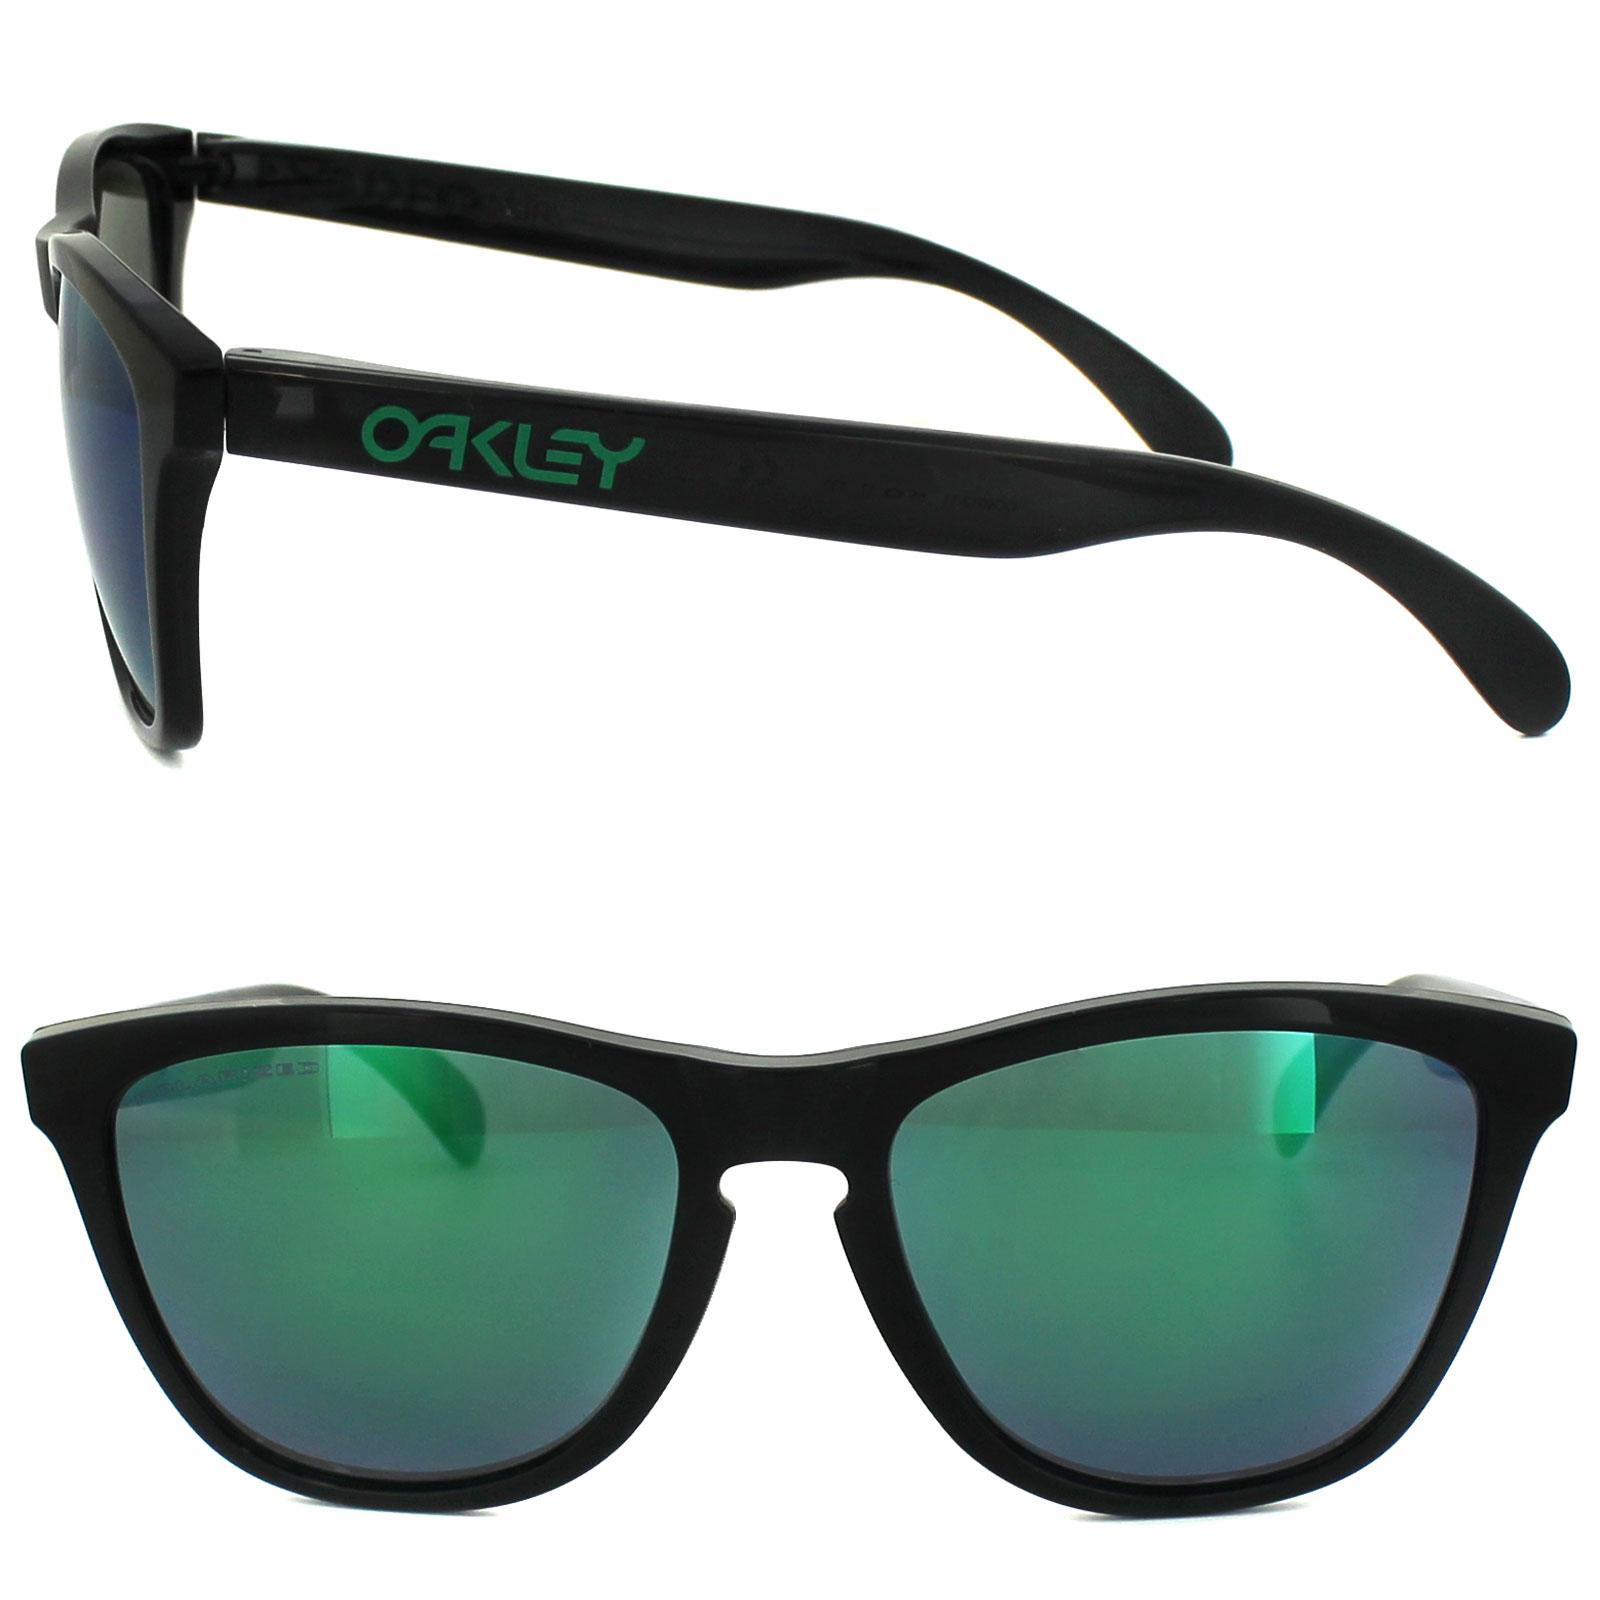 Oakley Frogskins Sunglasses  oakley frogskins sunglasses ed sunglasses